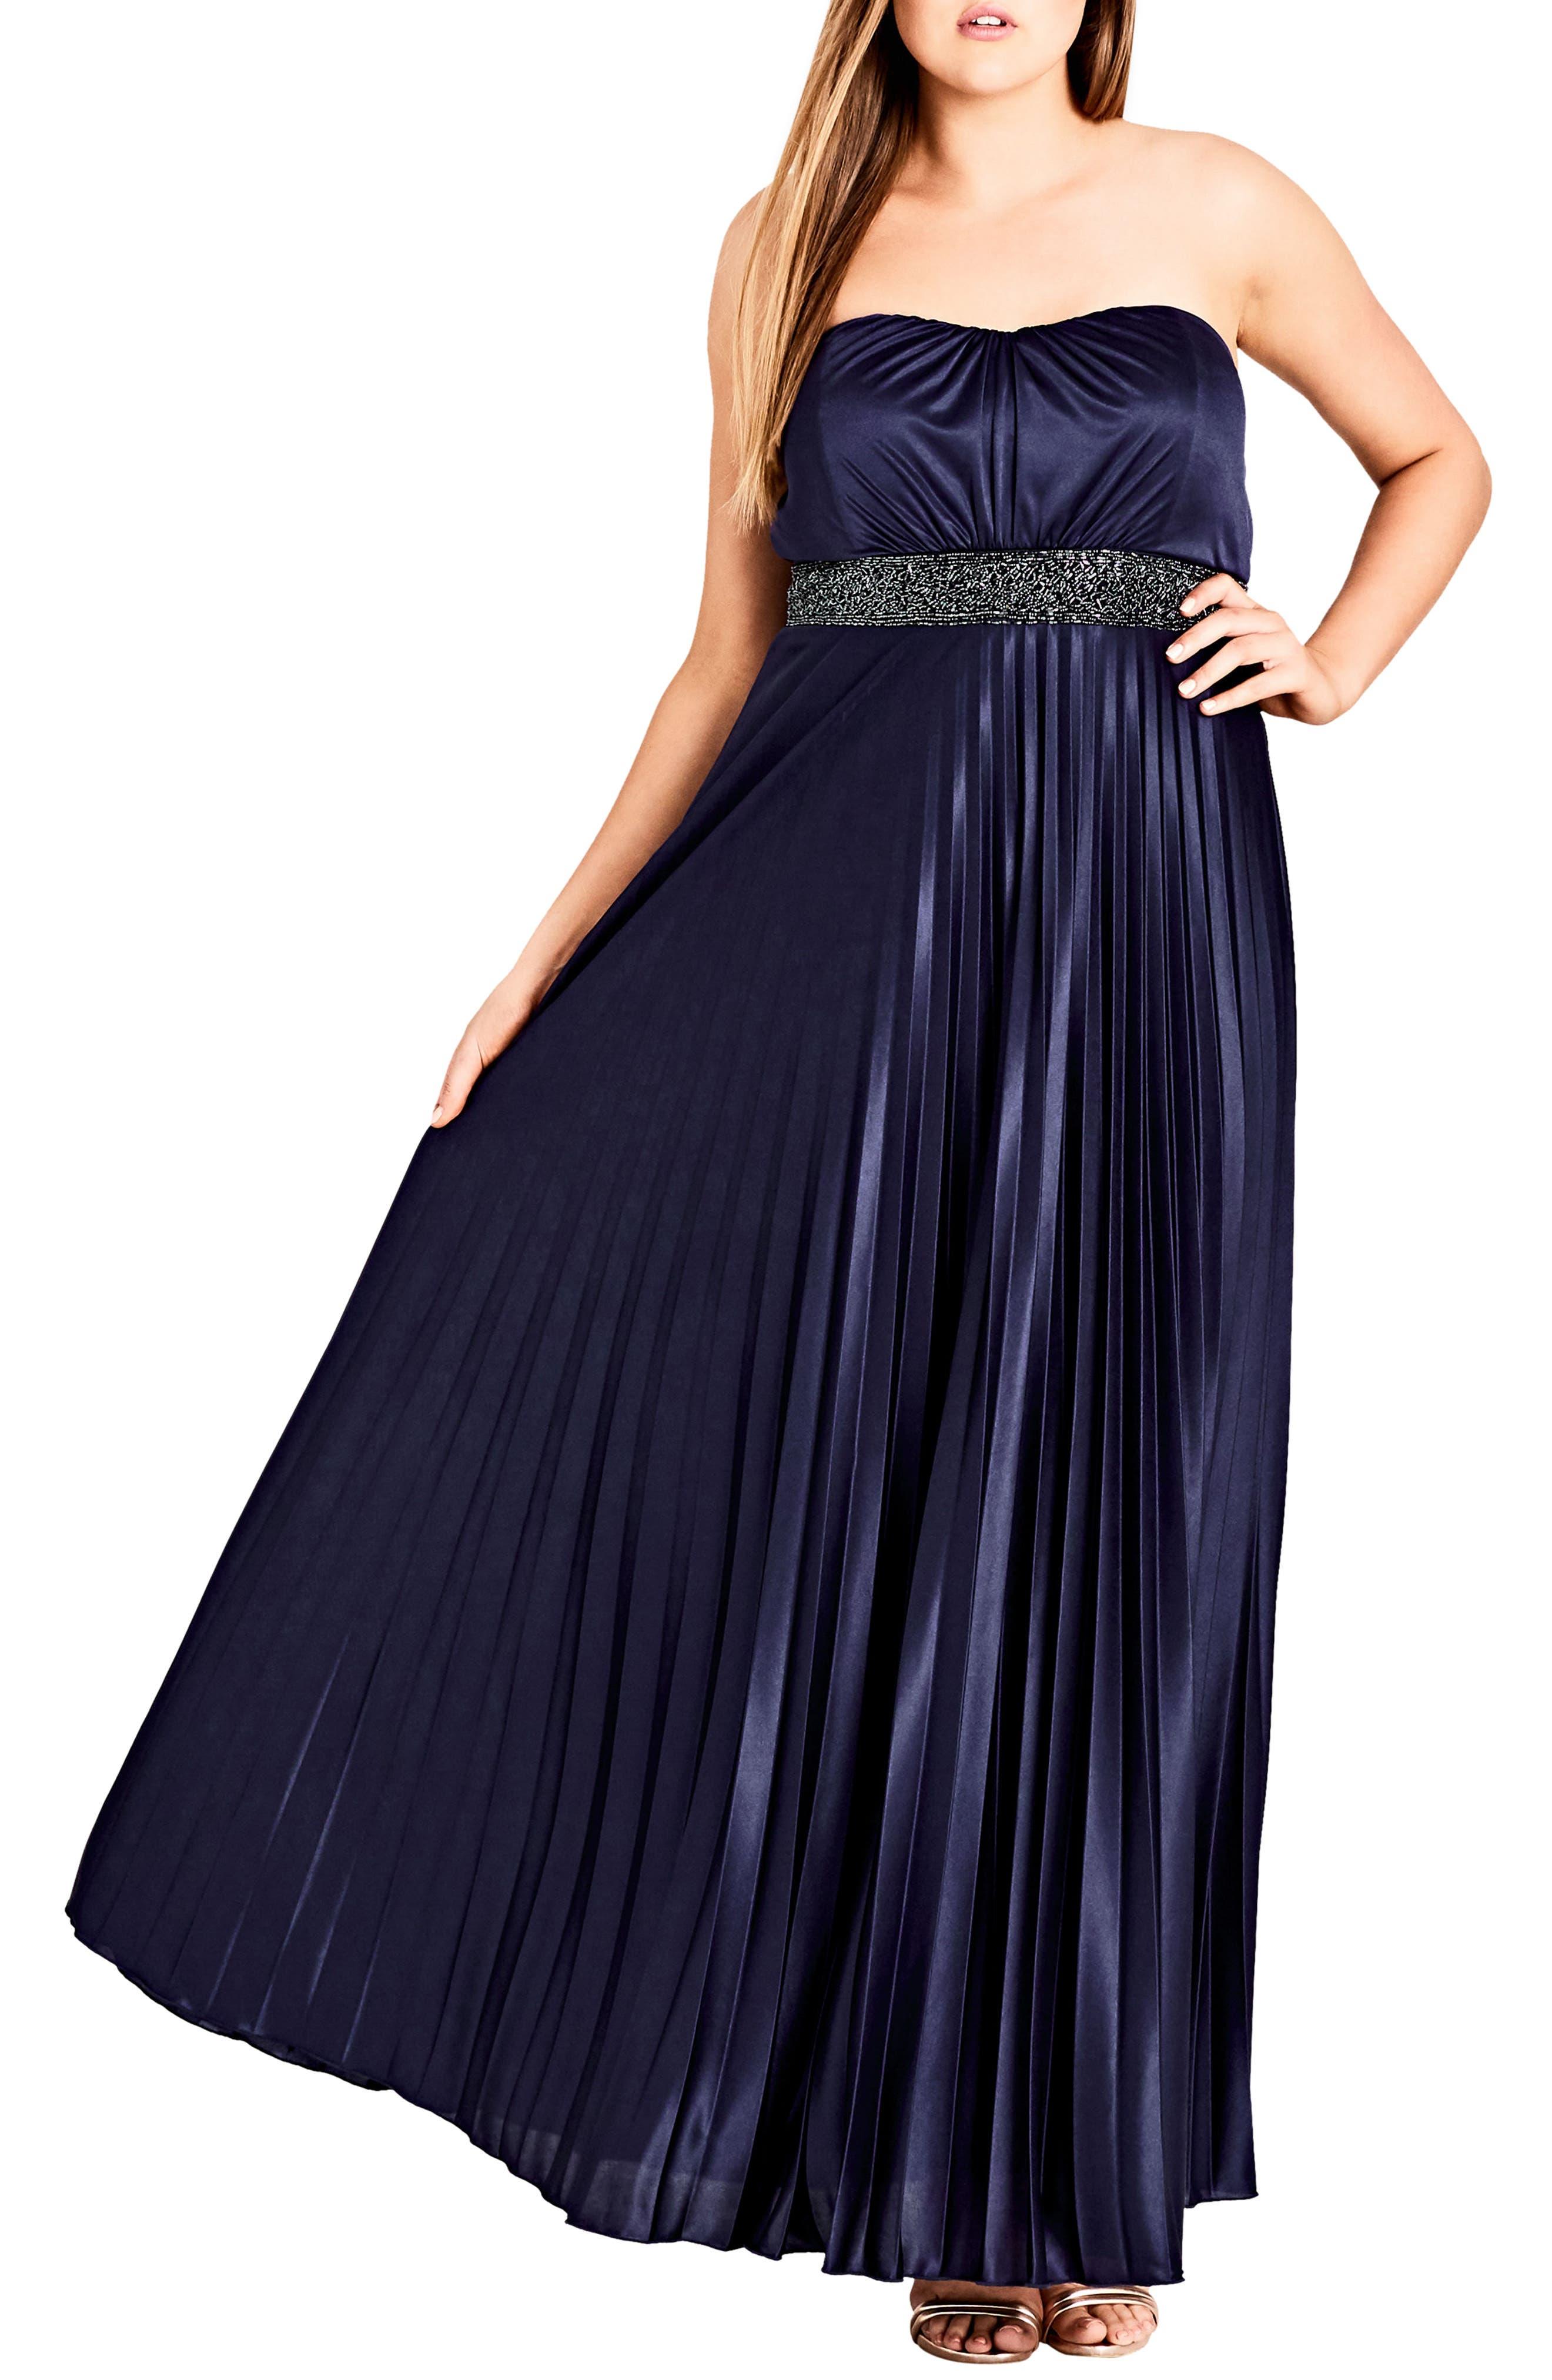 White Empire Dress Size 1X